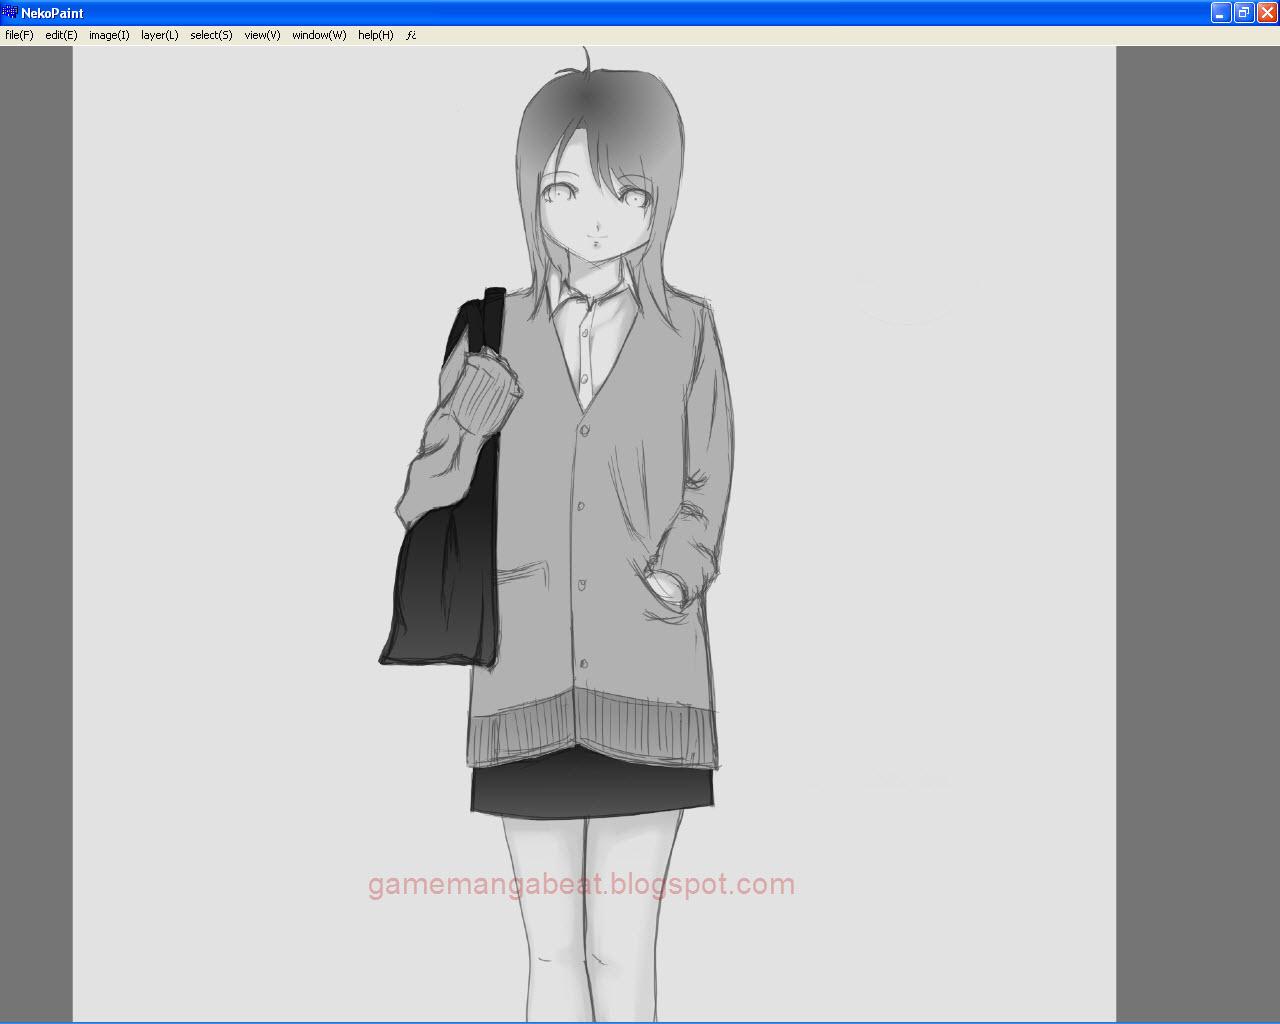 The manga journeyman how to draw manga and anime walkthrough 3